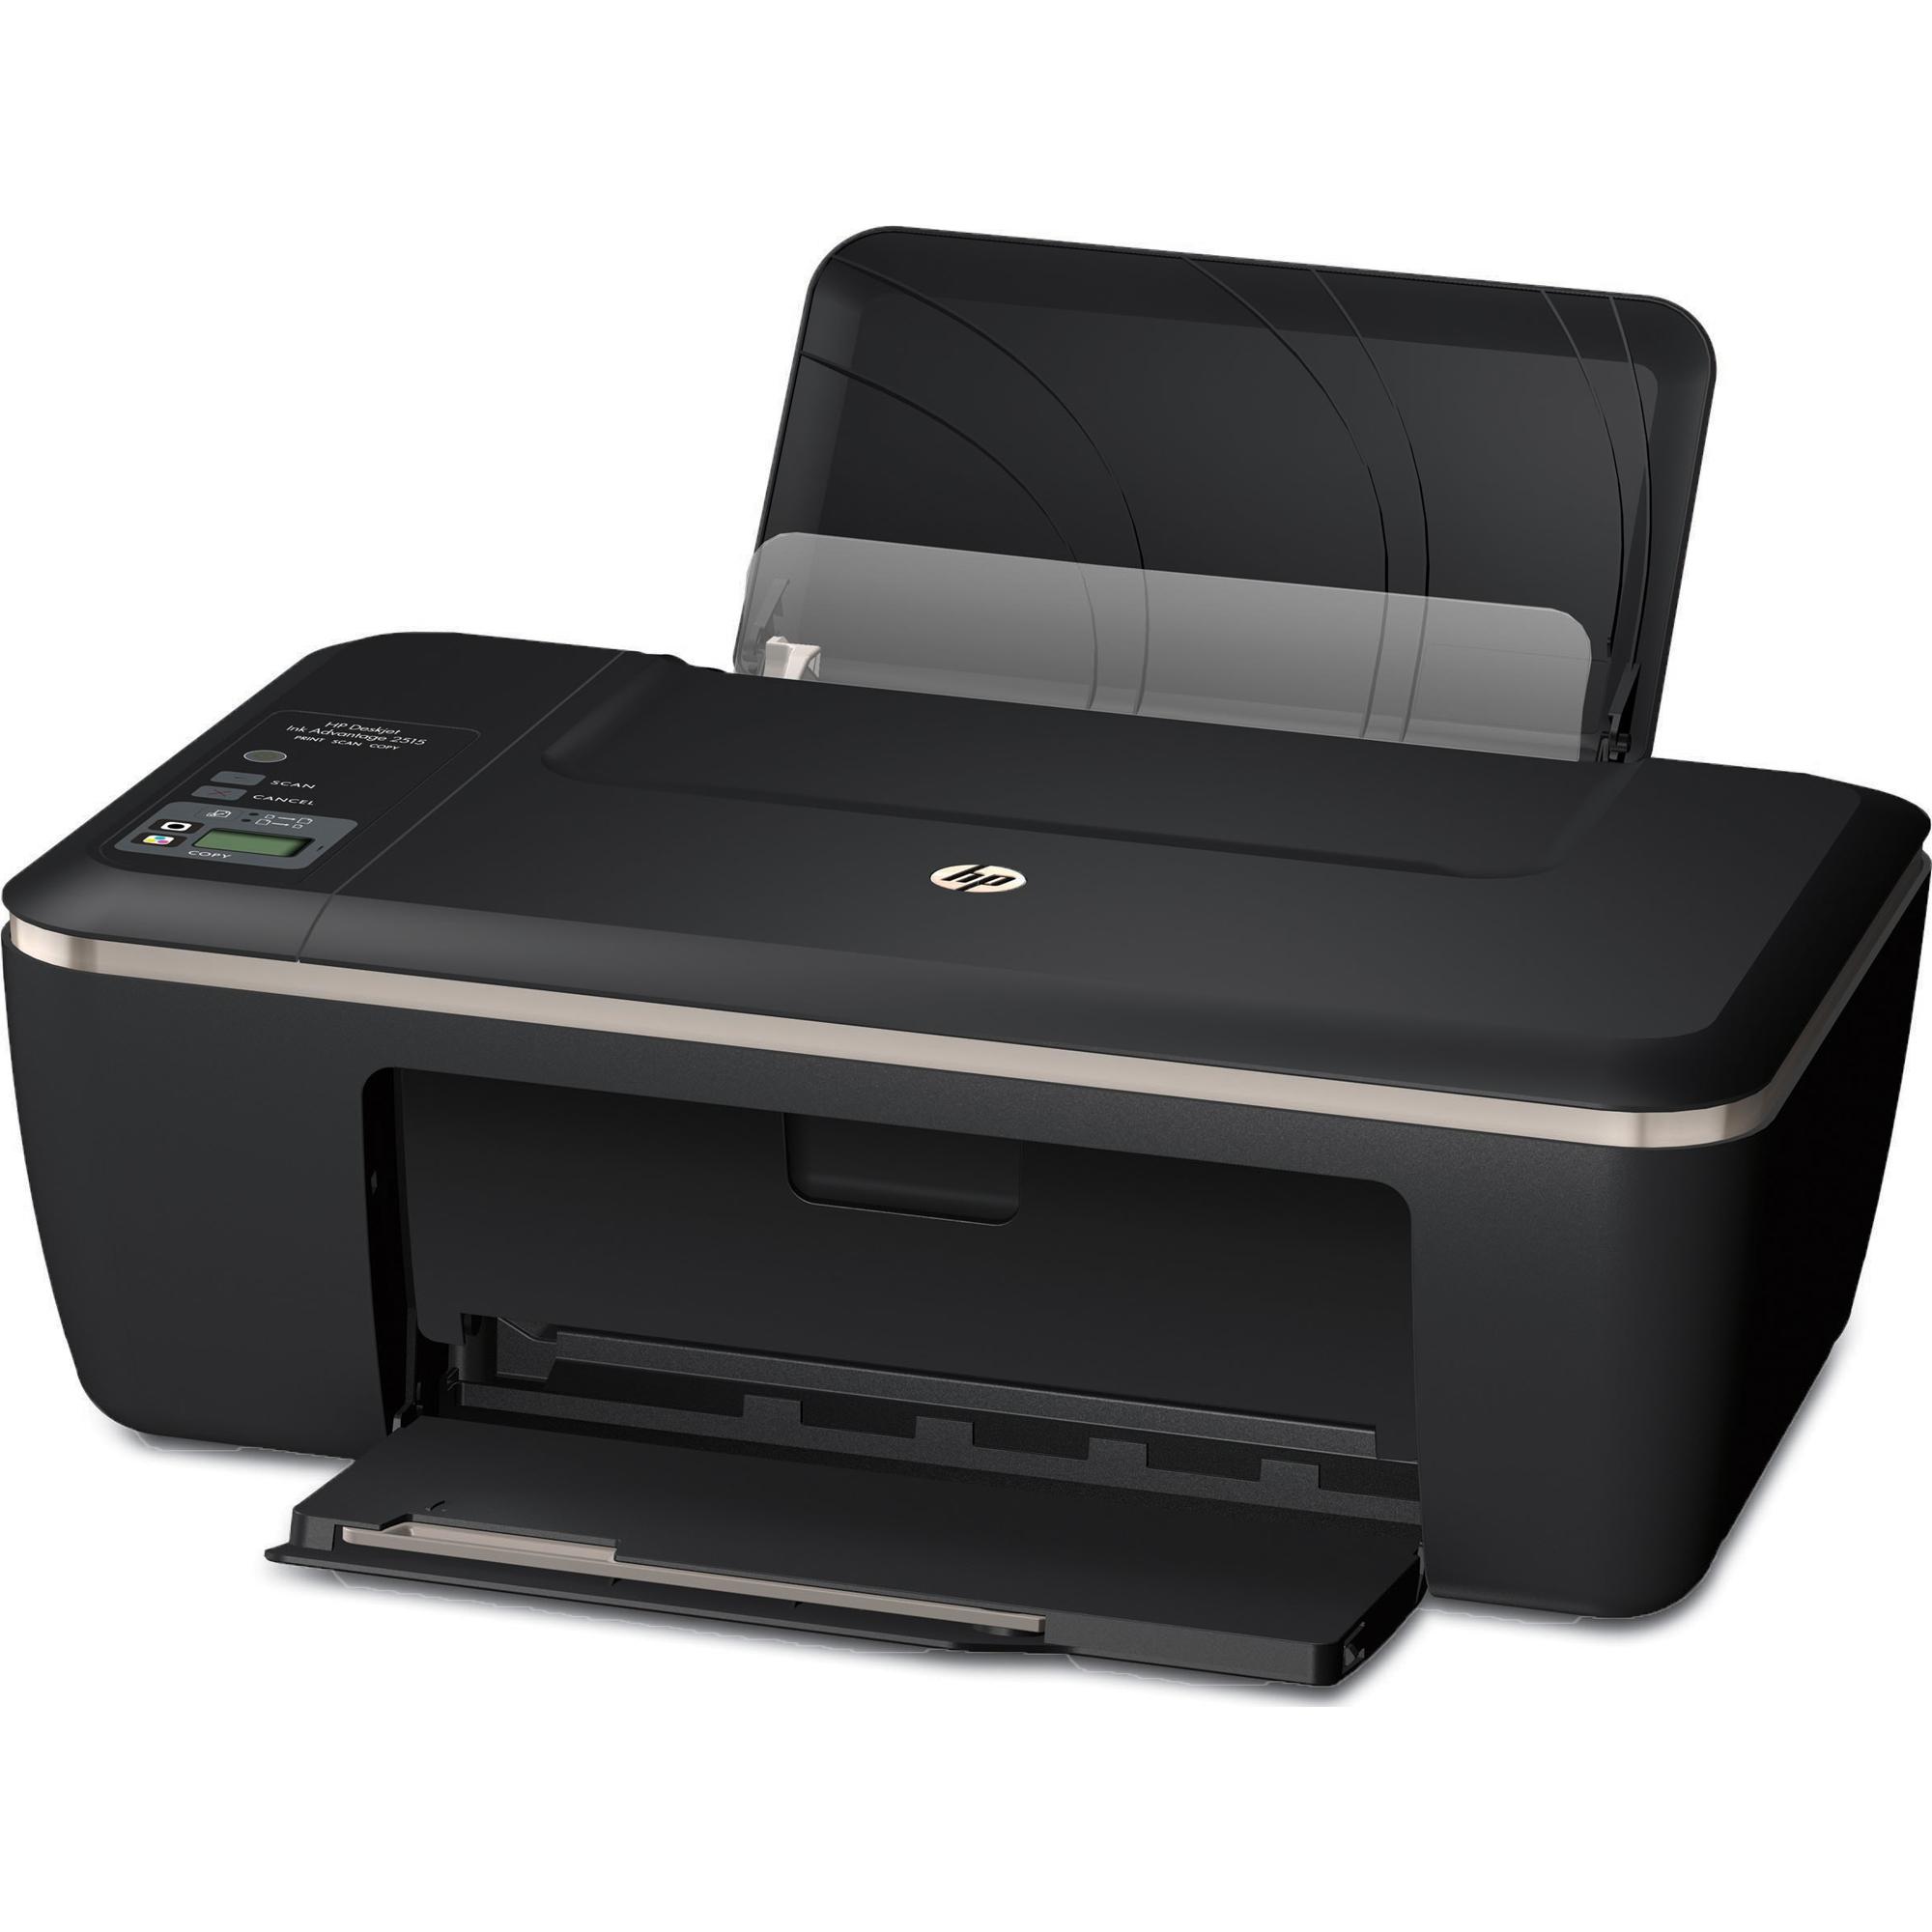 HP Deskjet Ink Advantage 2515 All-in-One Printer